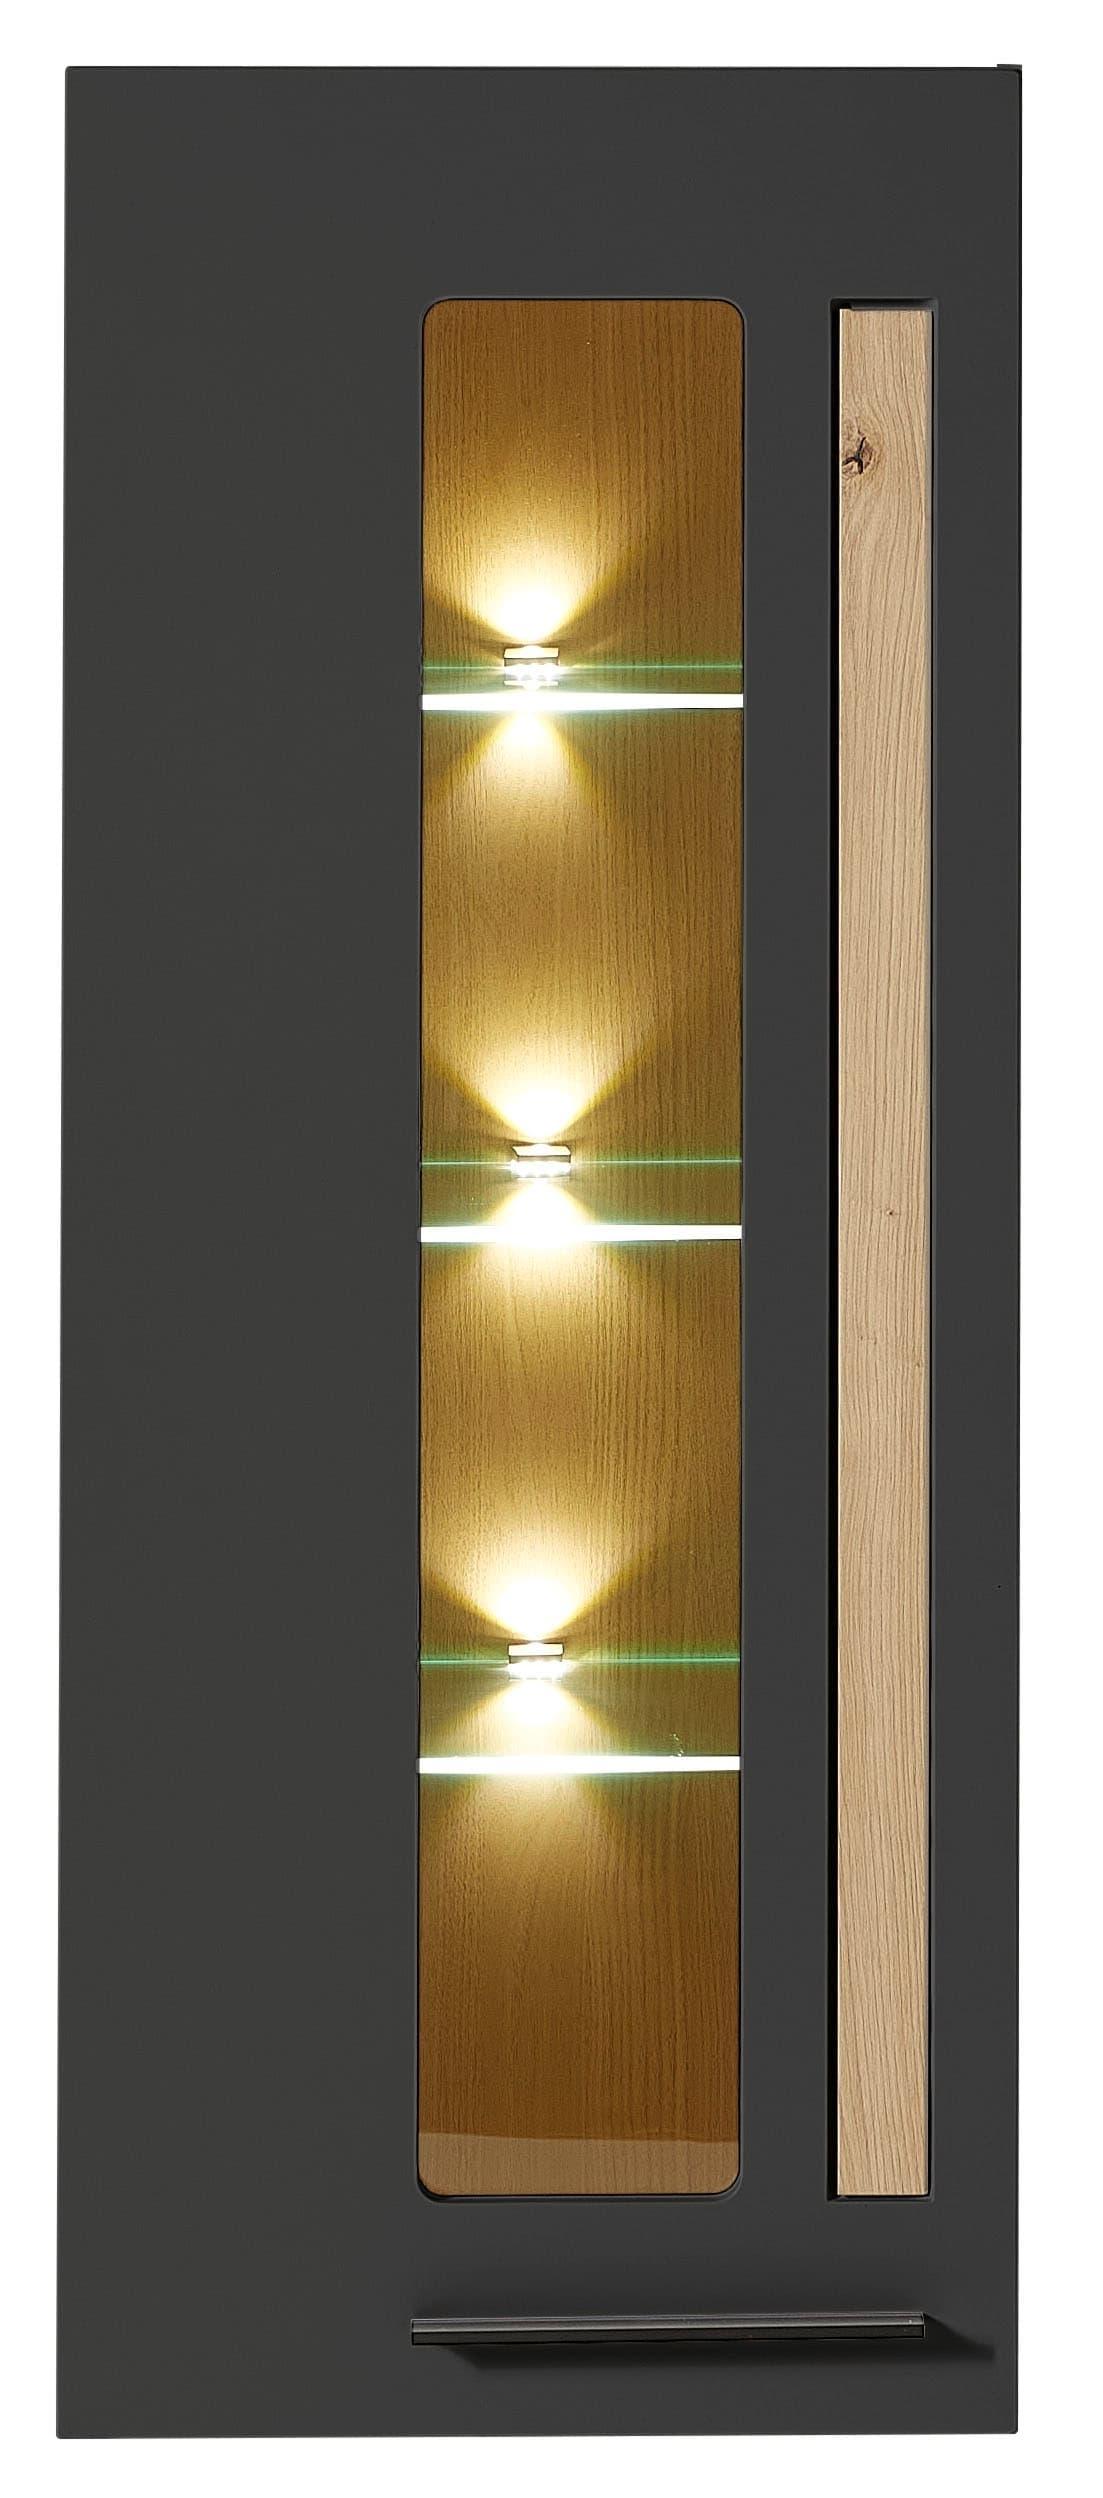 Vitrina suspendata din MDF, cu 1 usa si LED inclus Loftis Grafit / Stejar, l52xA37xH128 cm imagine